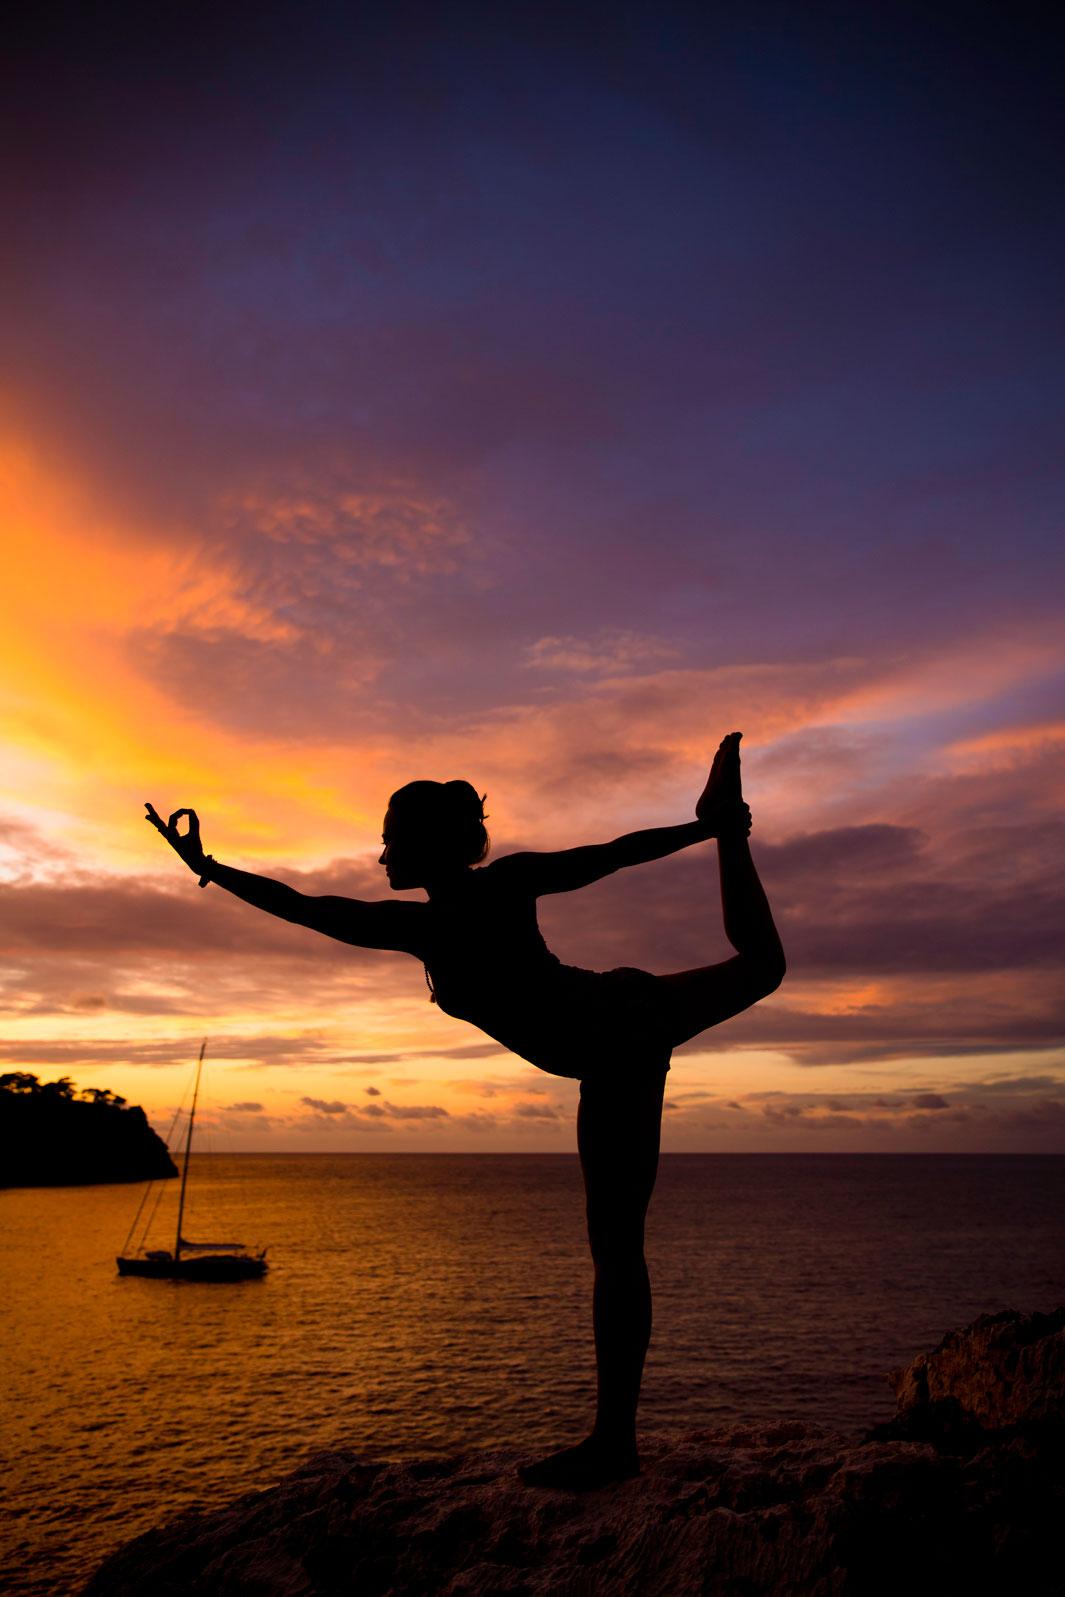 170903_Yoga-Marisol_380_cc-(RGB)_by-Lina-Schuetze_web